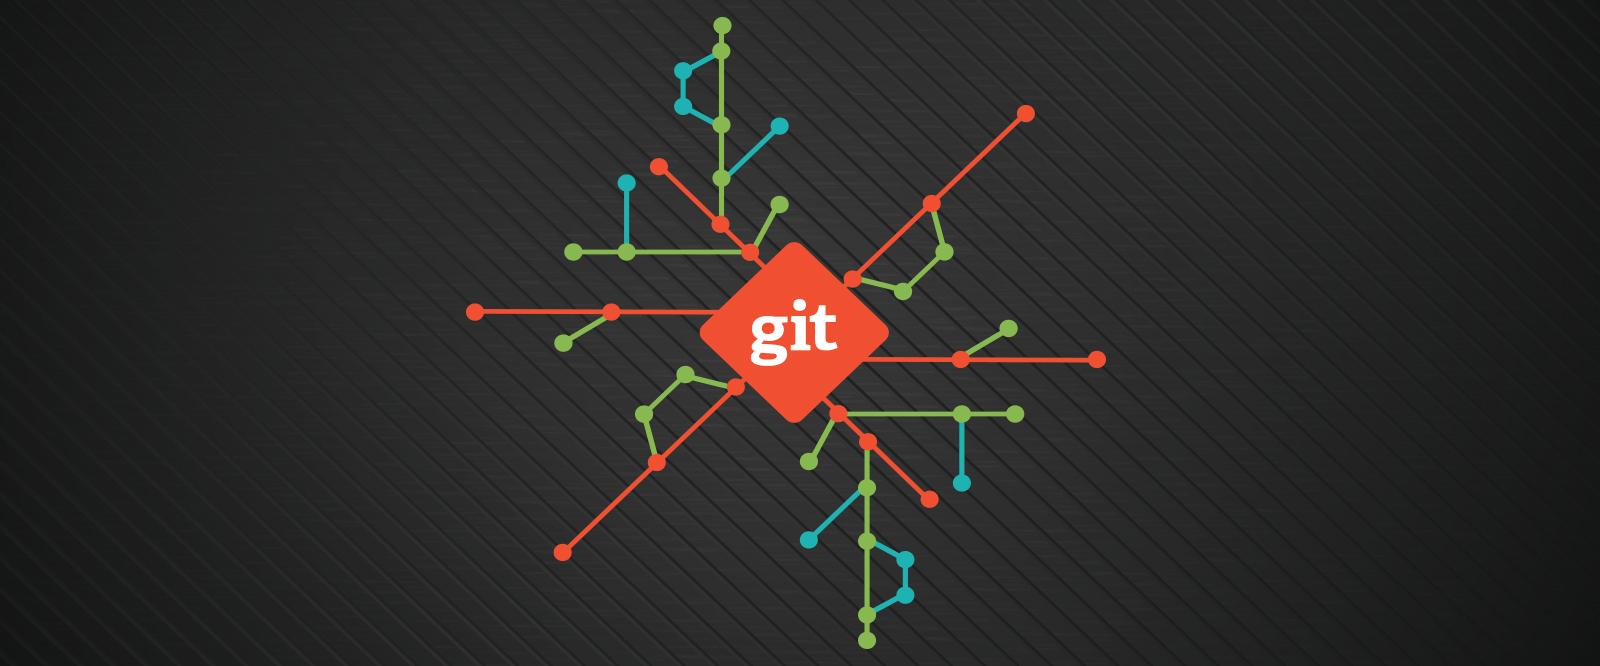 GIT-branches